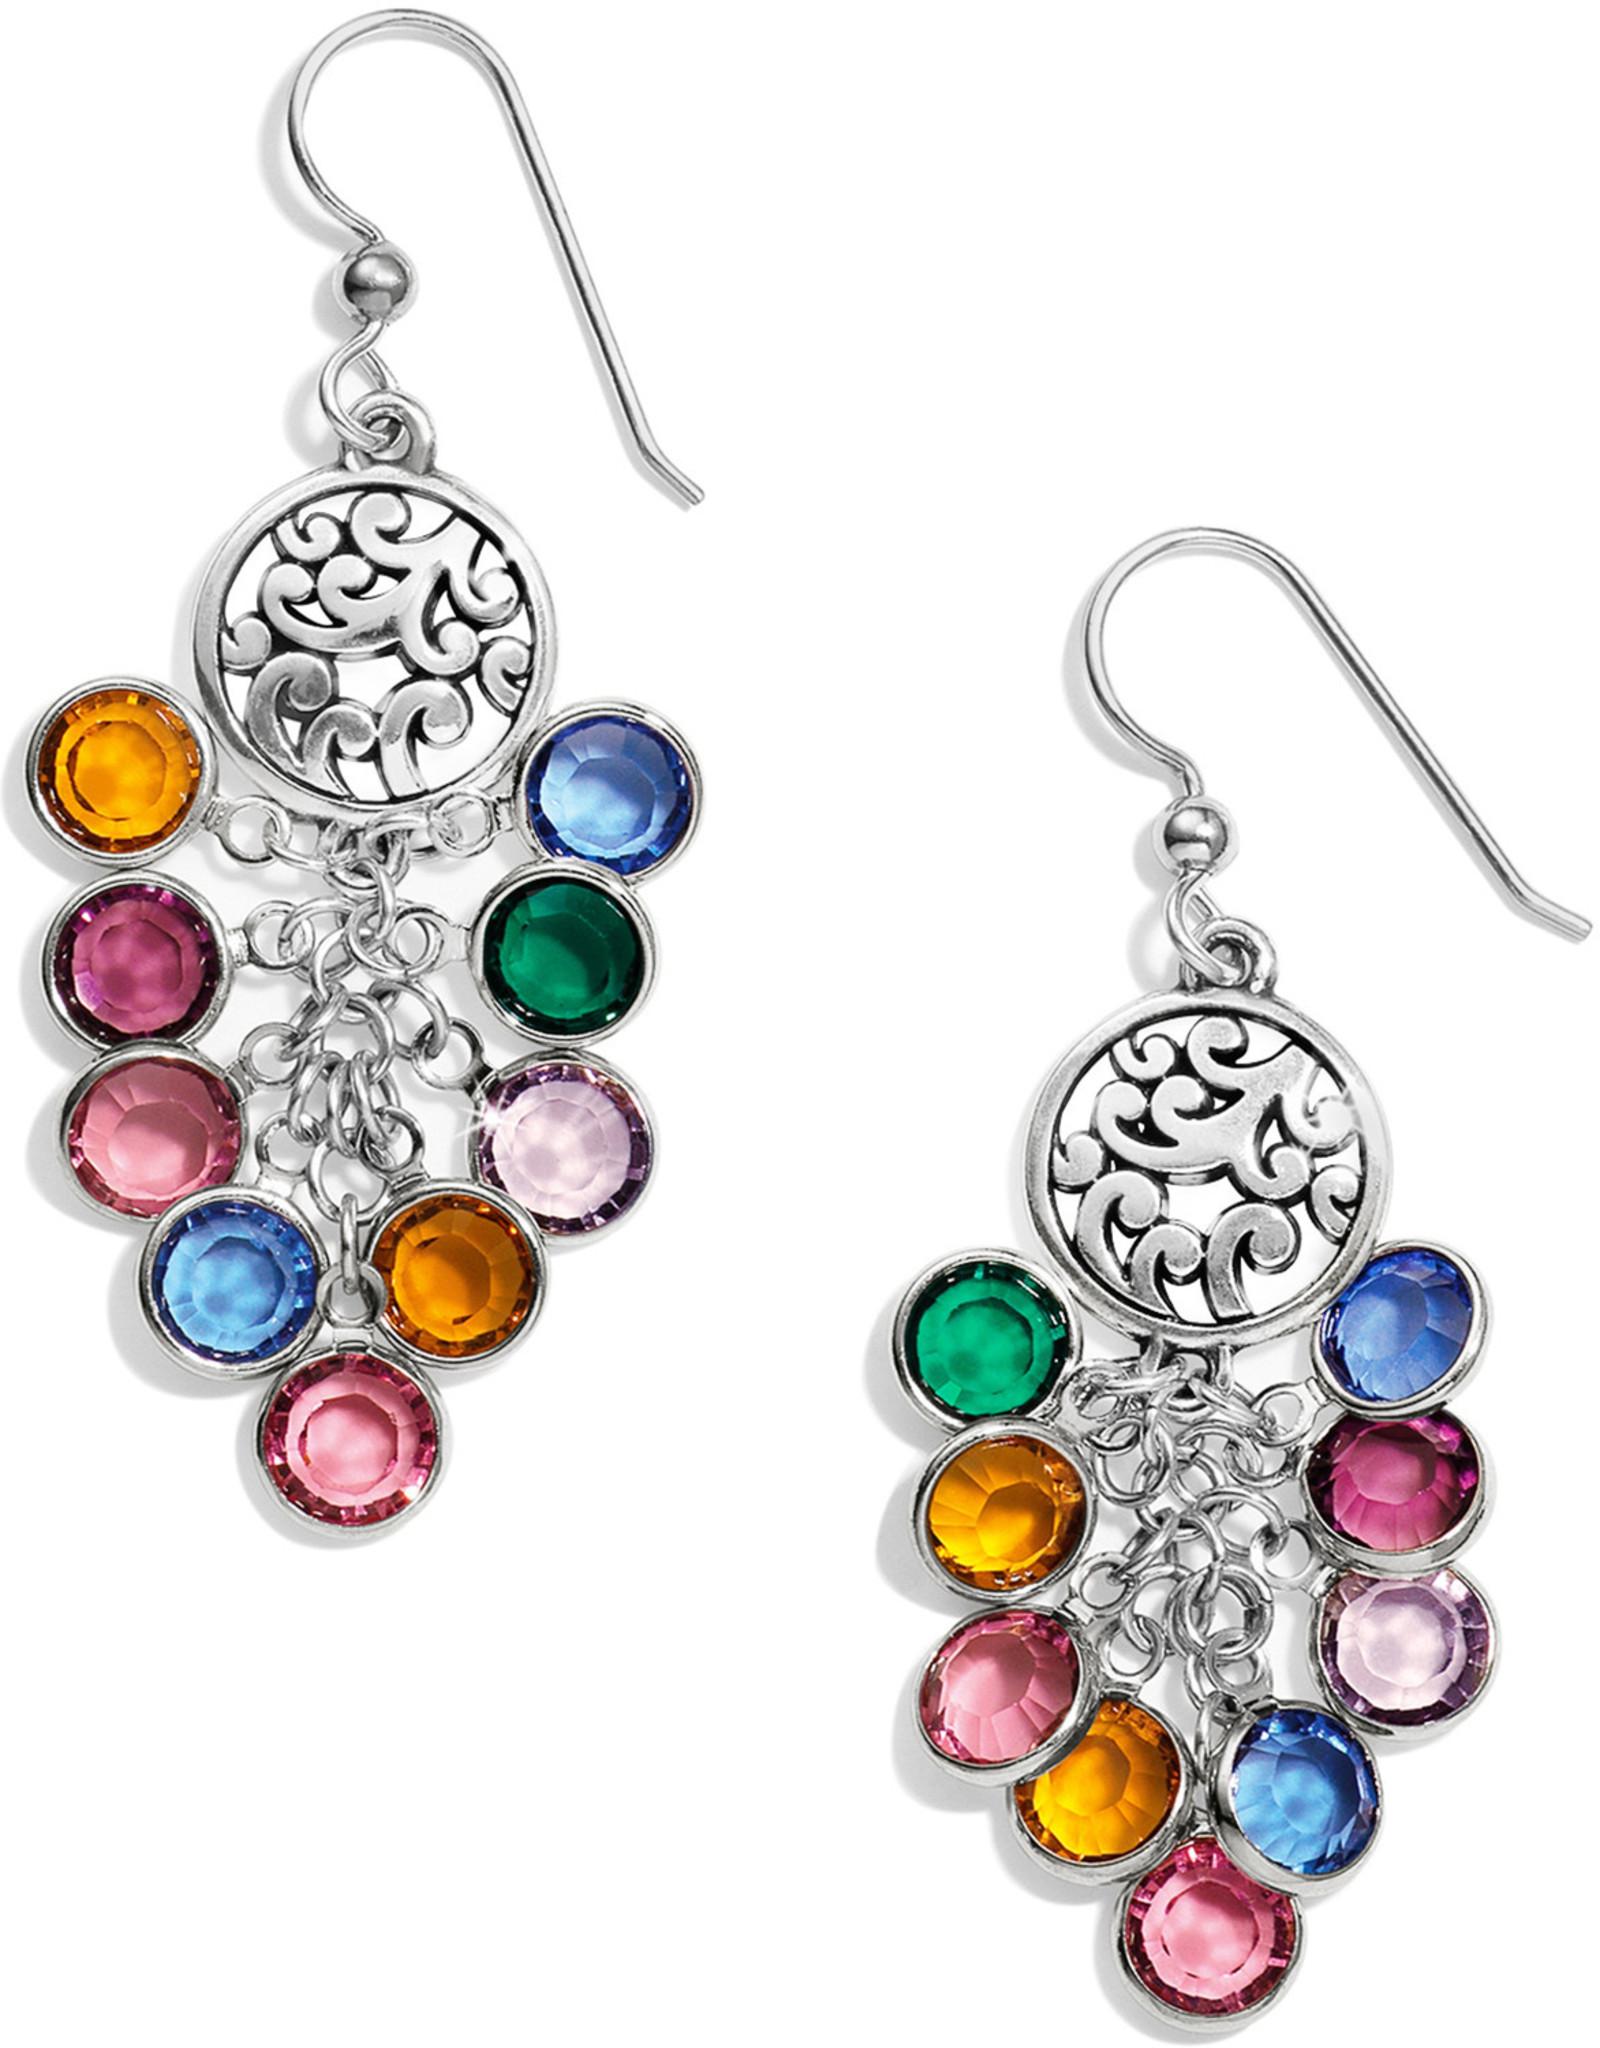 Brighton Brighton earrings Elora Gems Casca